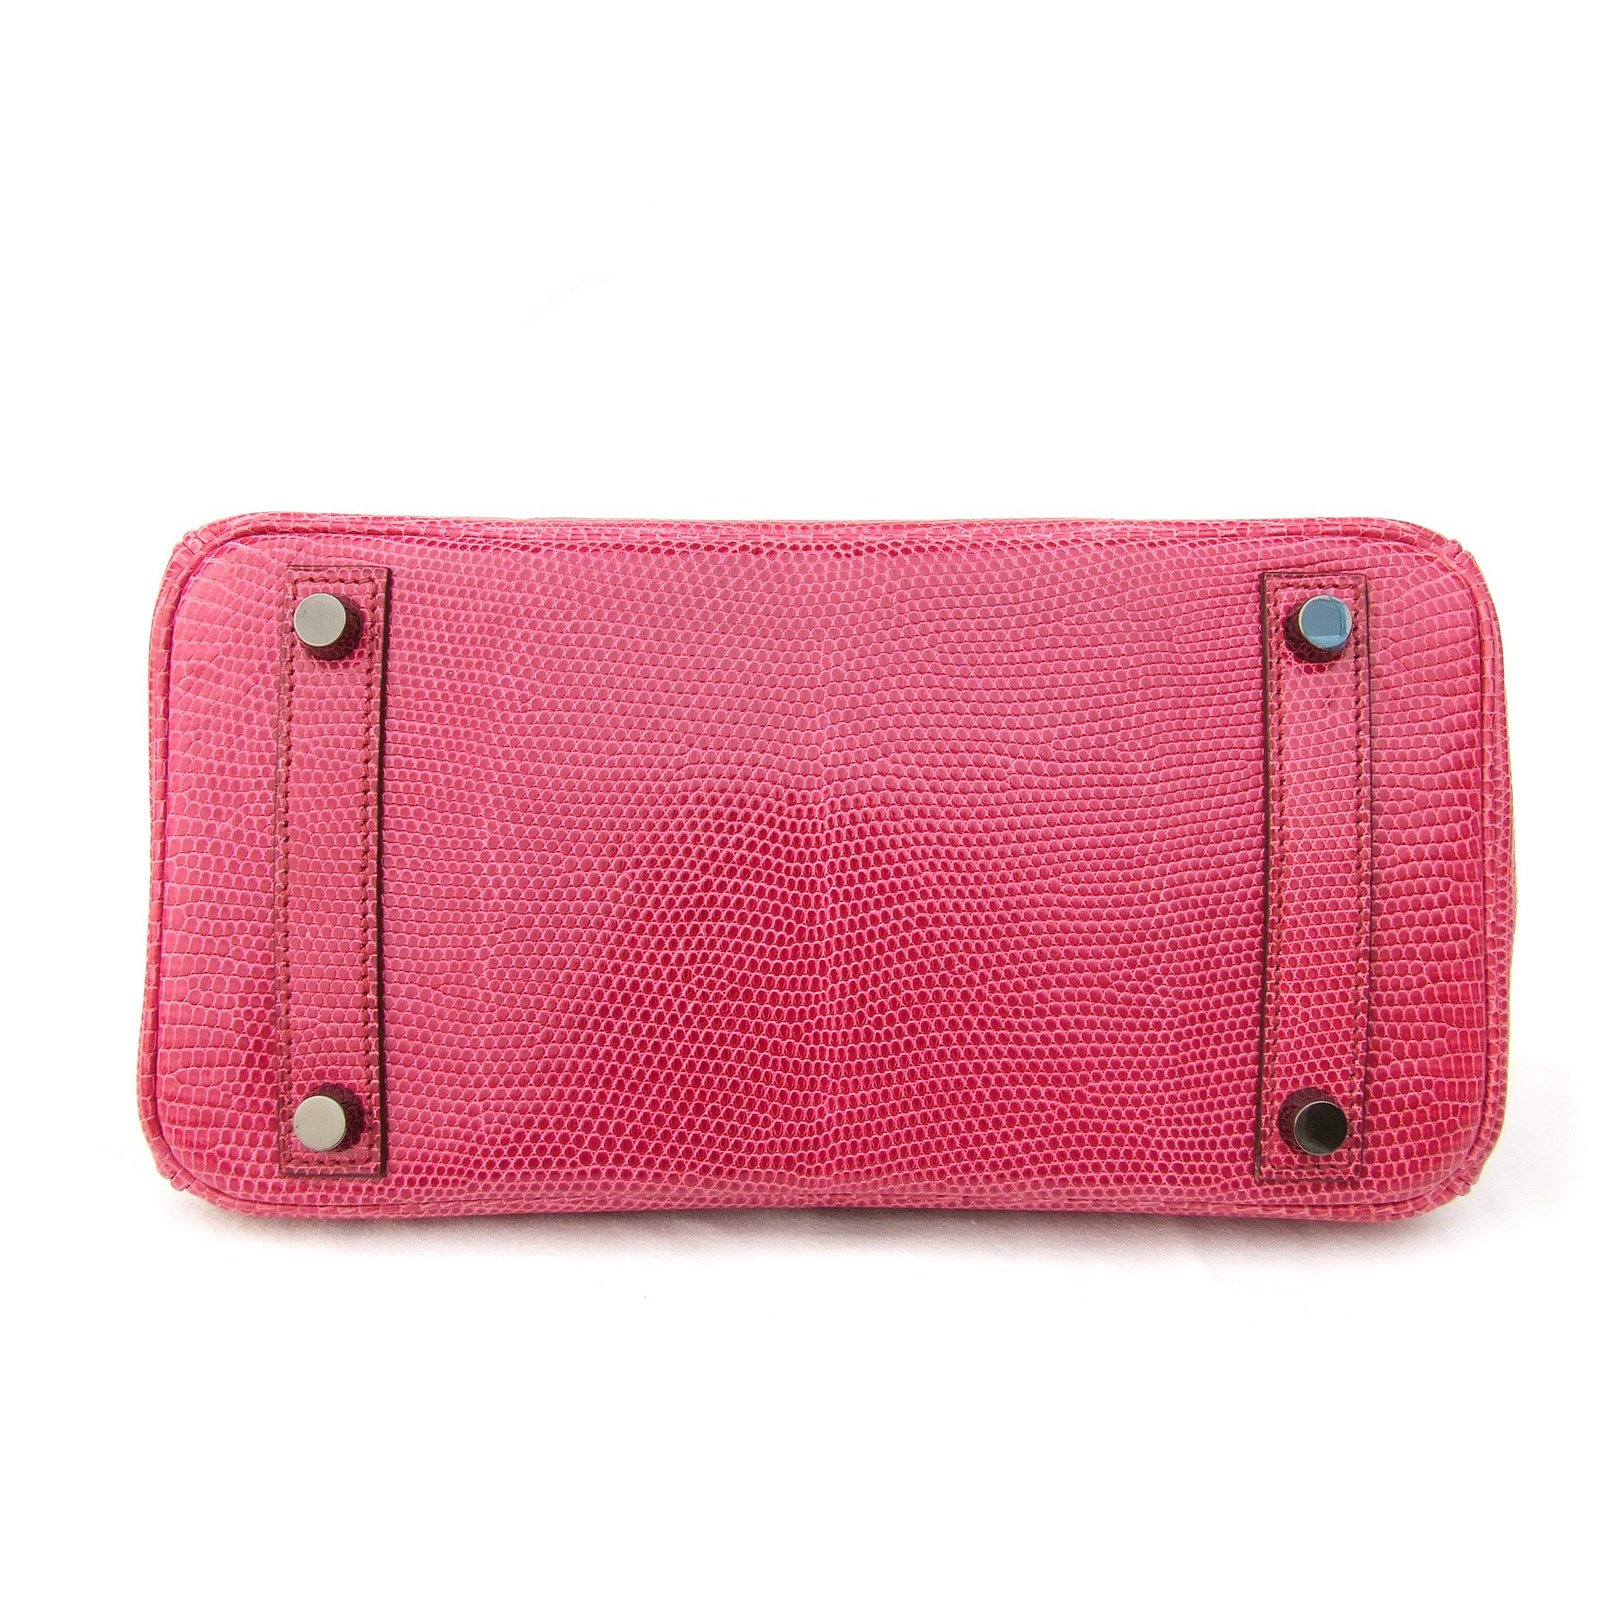 daeb68e08bc Hermès Hermès Birkin 25 Handbags Exotic leather Pink ref.48556 - Joli Closet